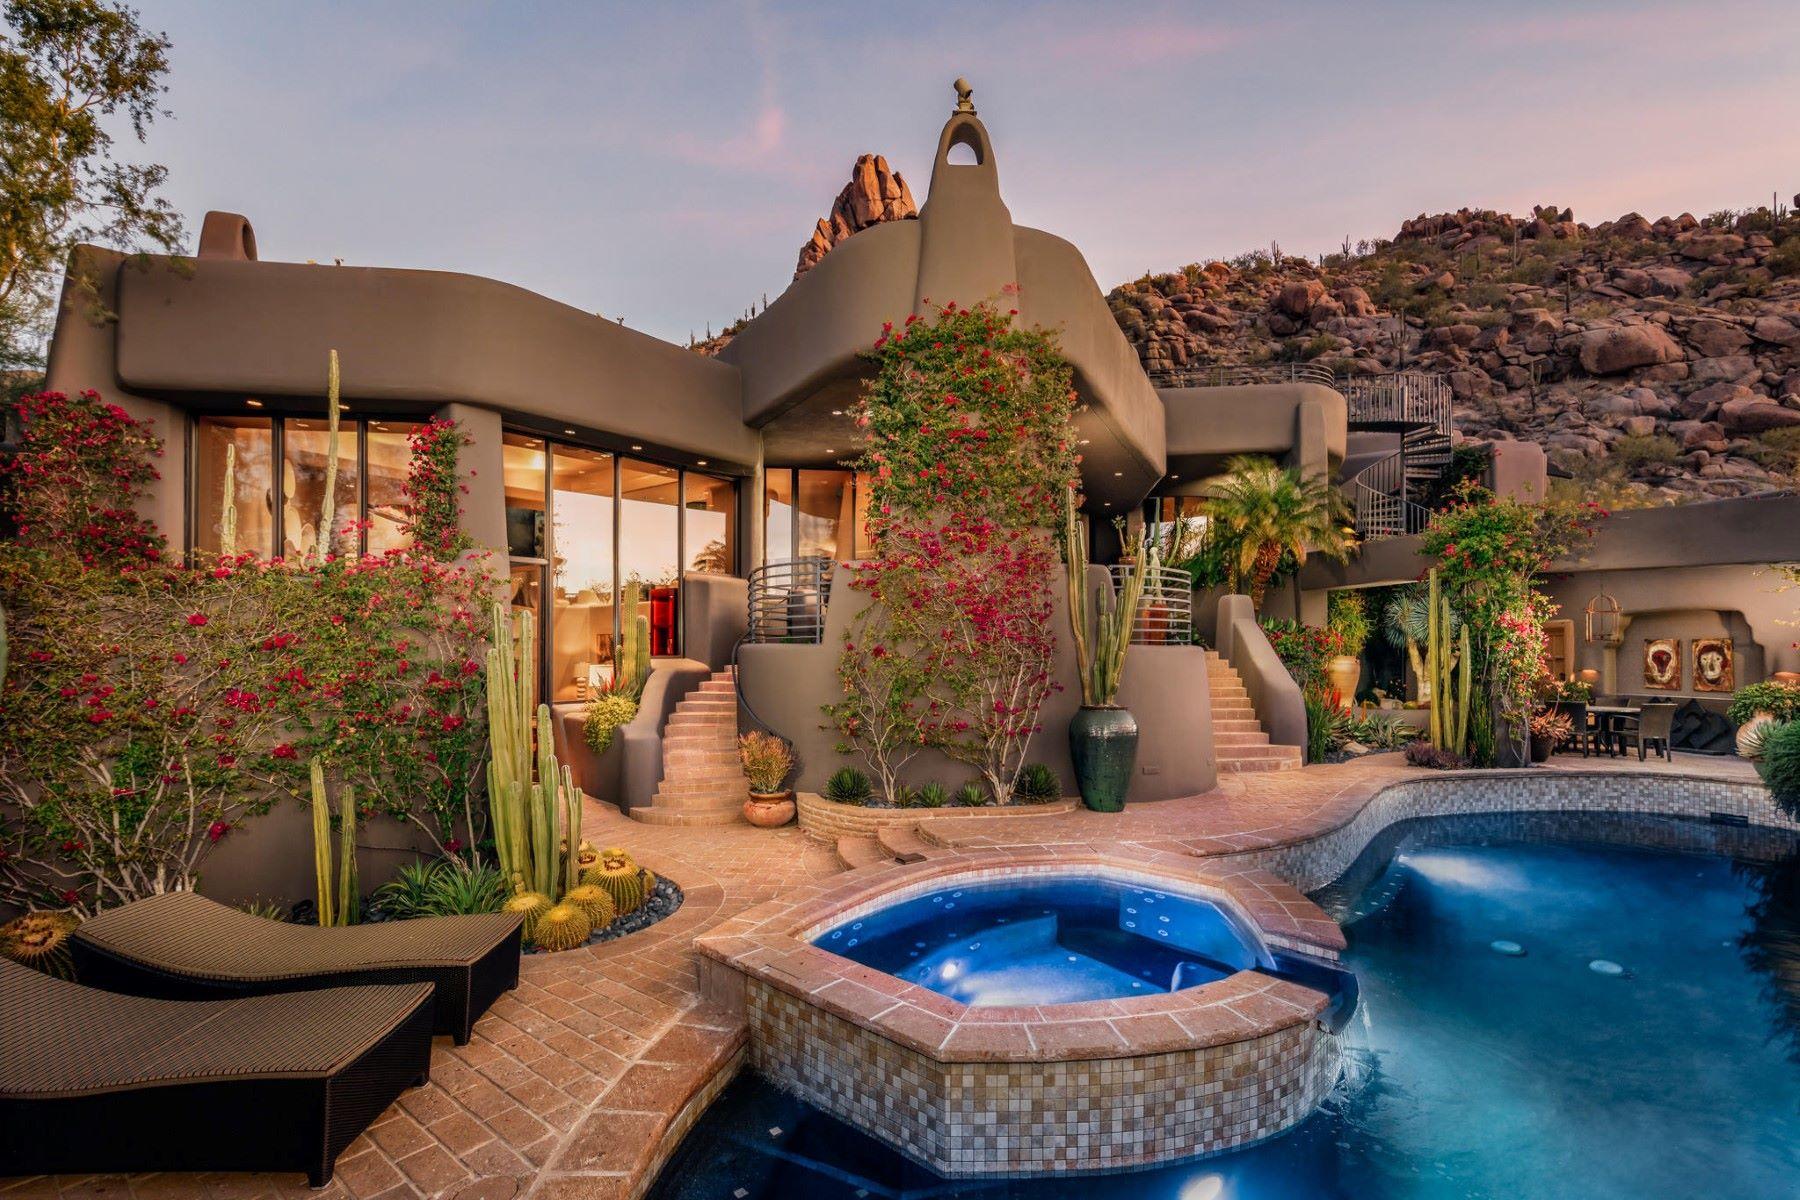 Moradia para Venda às Hillside Villa Estates 10040 E Happy Valley Rd #1049, Scottsdale, Arizona, 85255 Estados Unidos